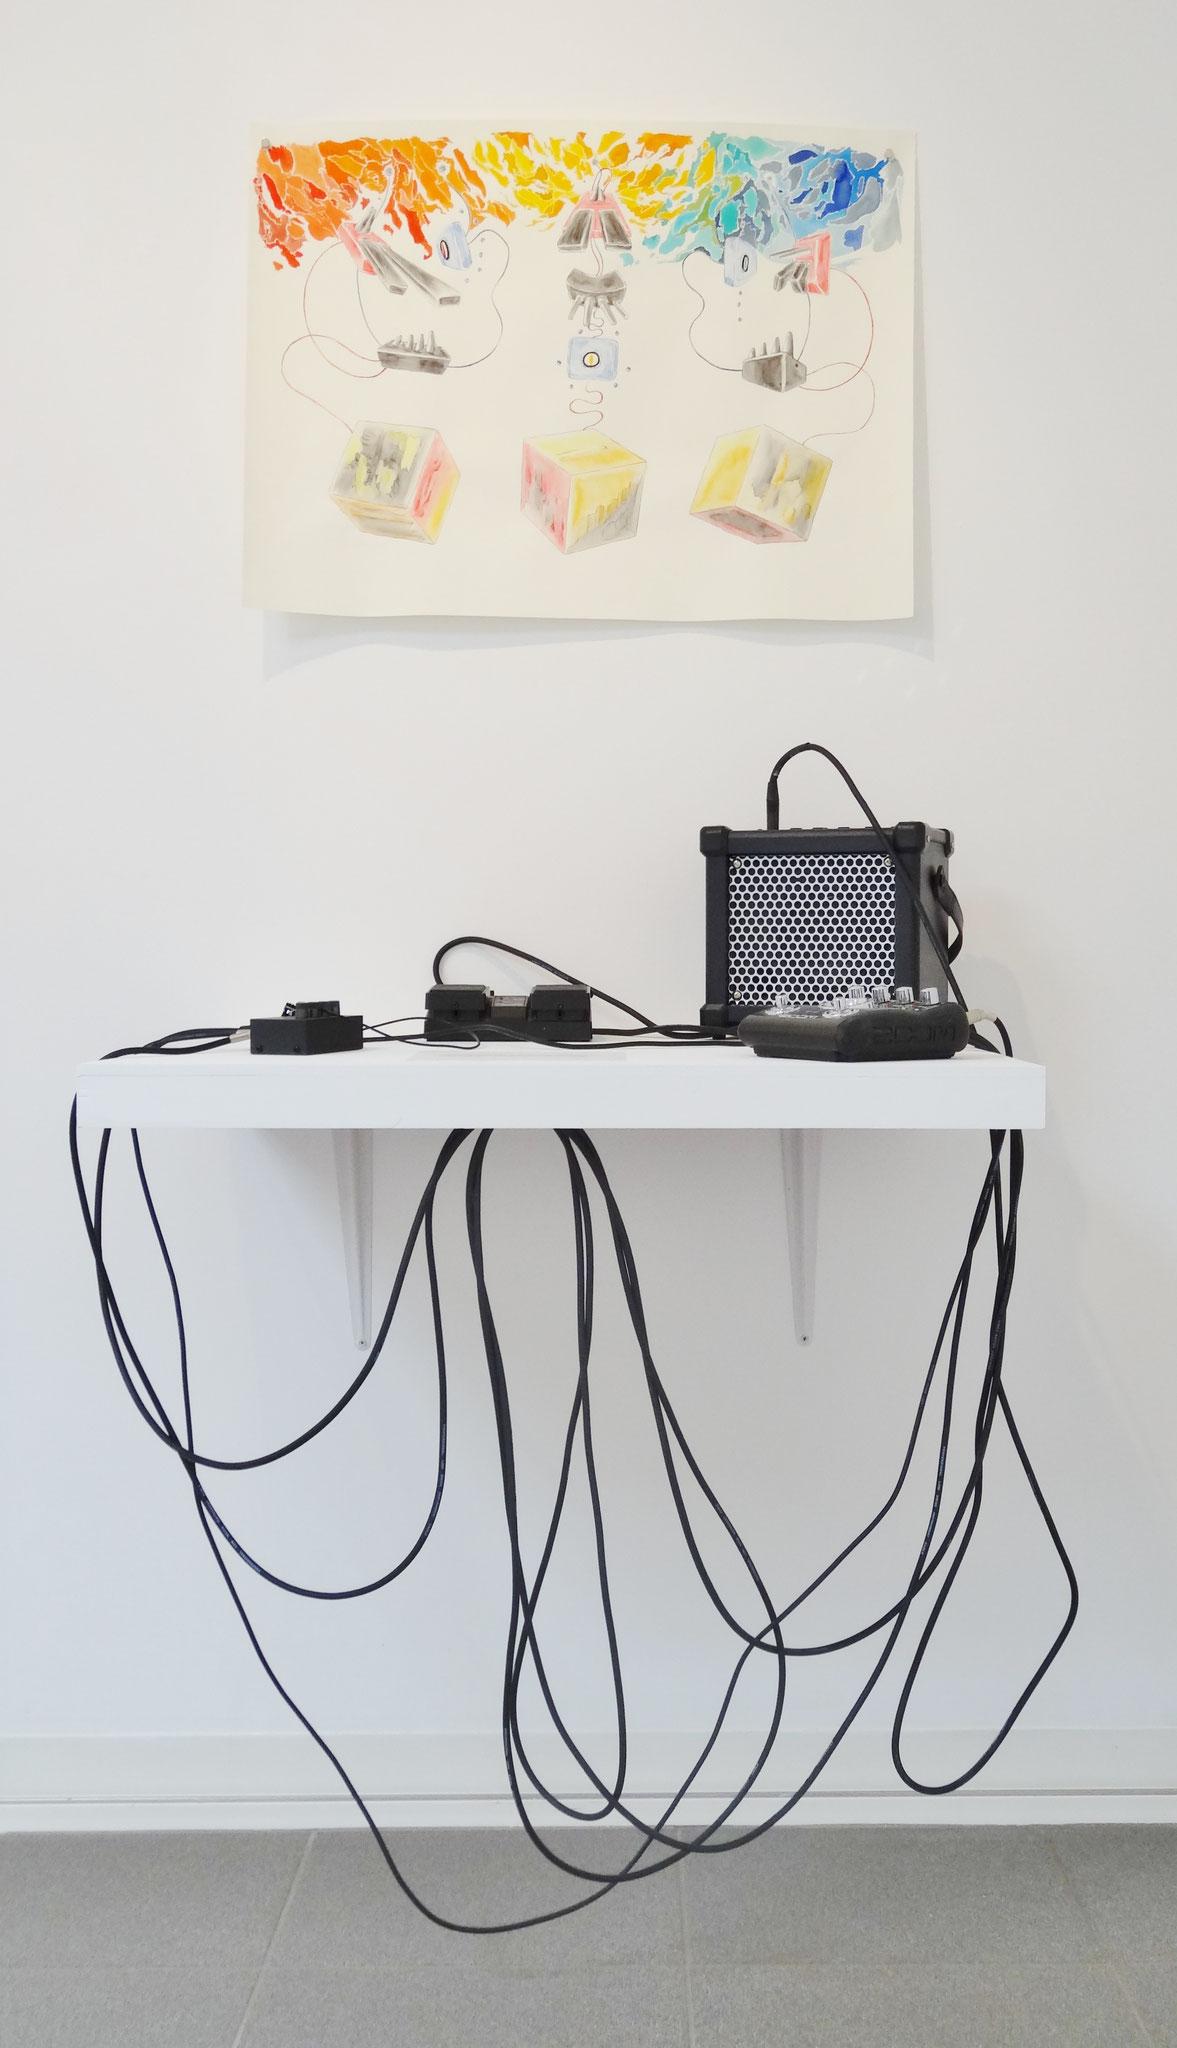 Noël Rasendrason, In-stall / D-stall / X-stall, 2016. Encre et aquarelle sur papier Artistico Fabriano 200 gr., 56 × 72 cm.